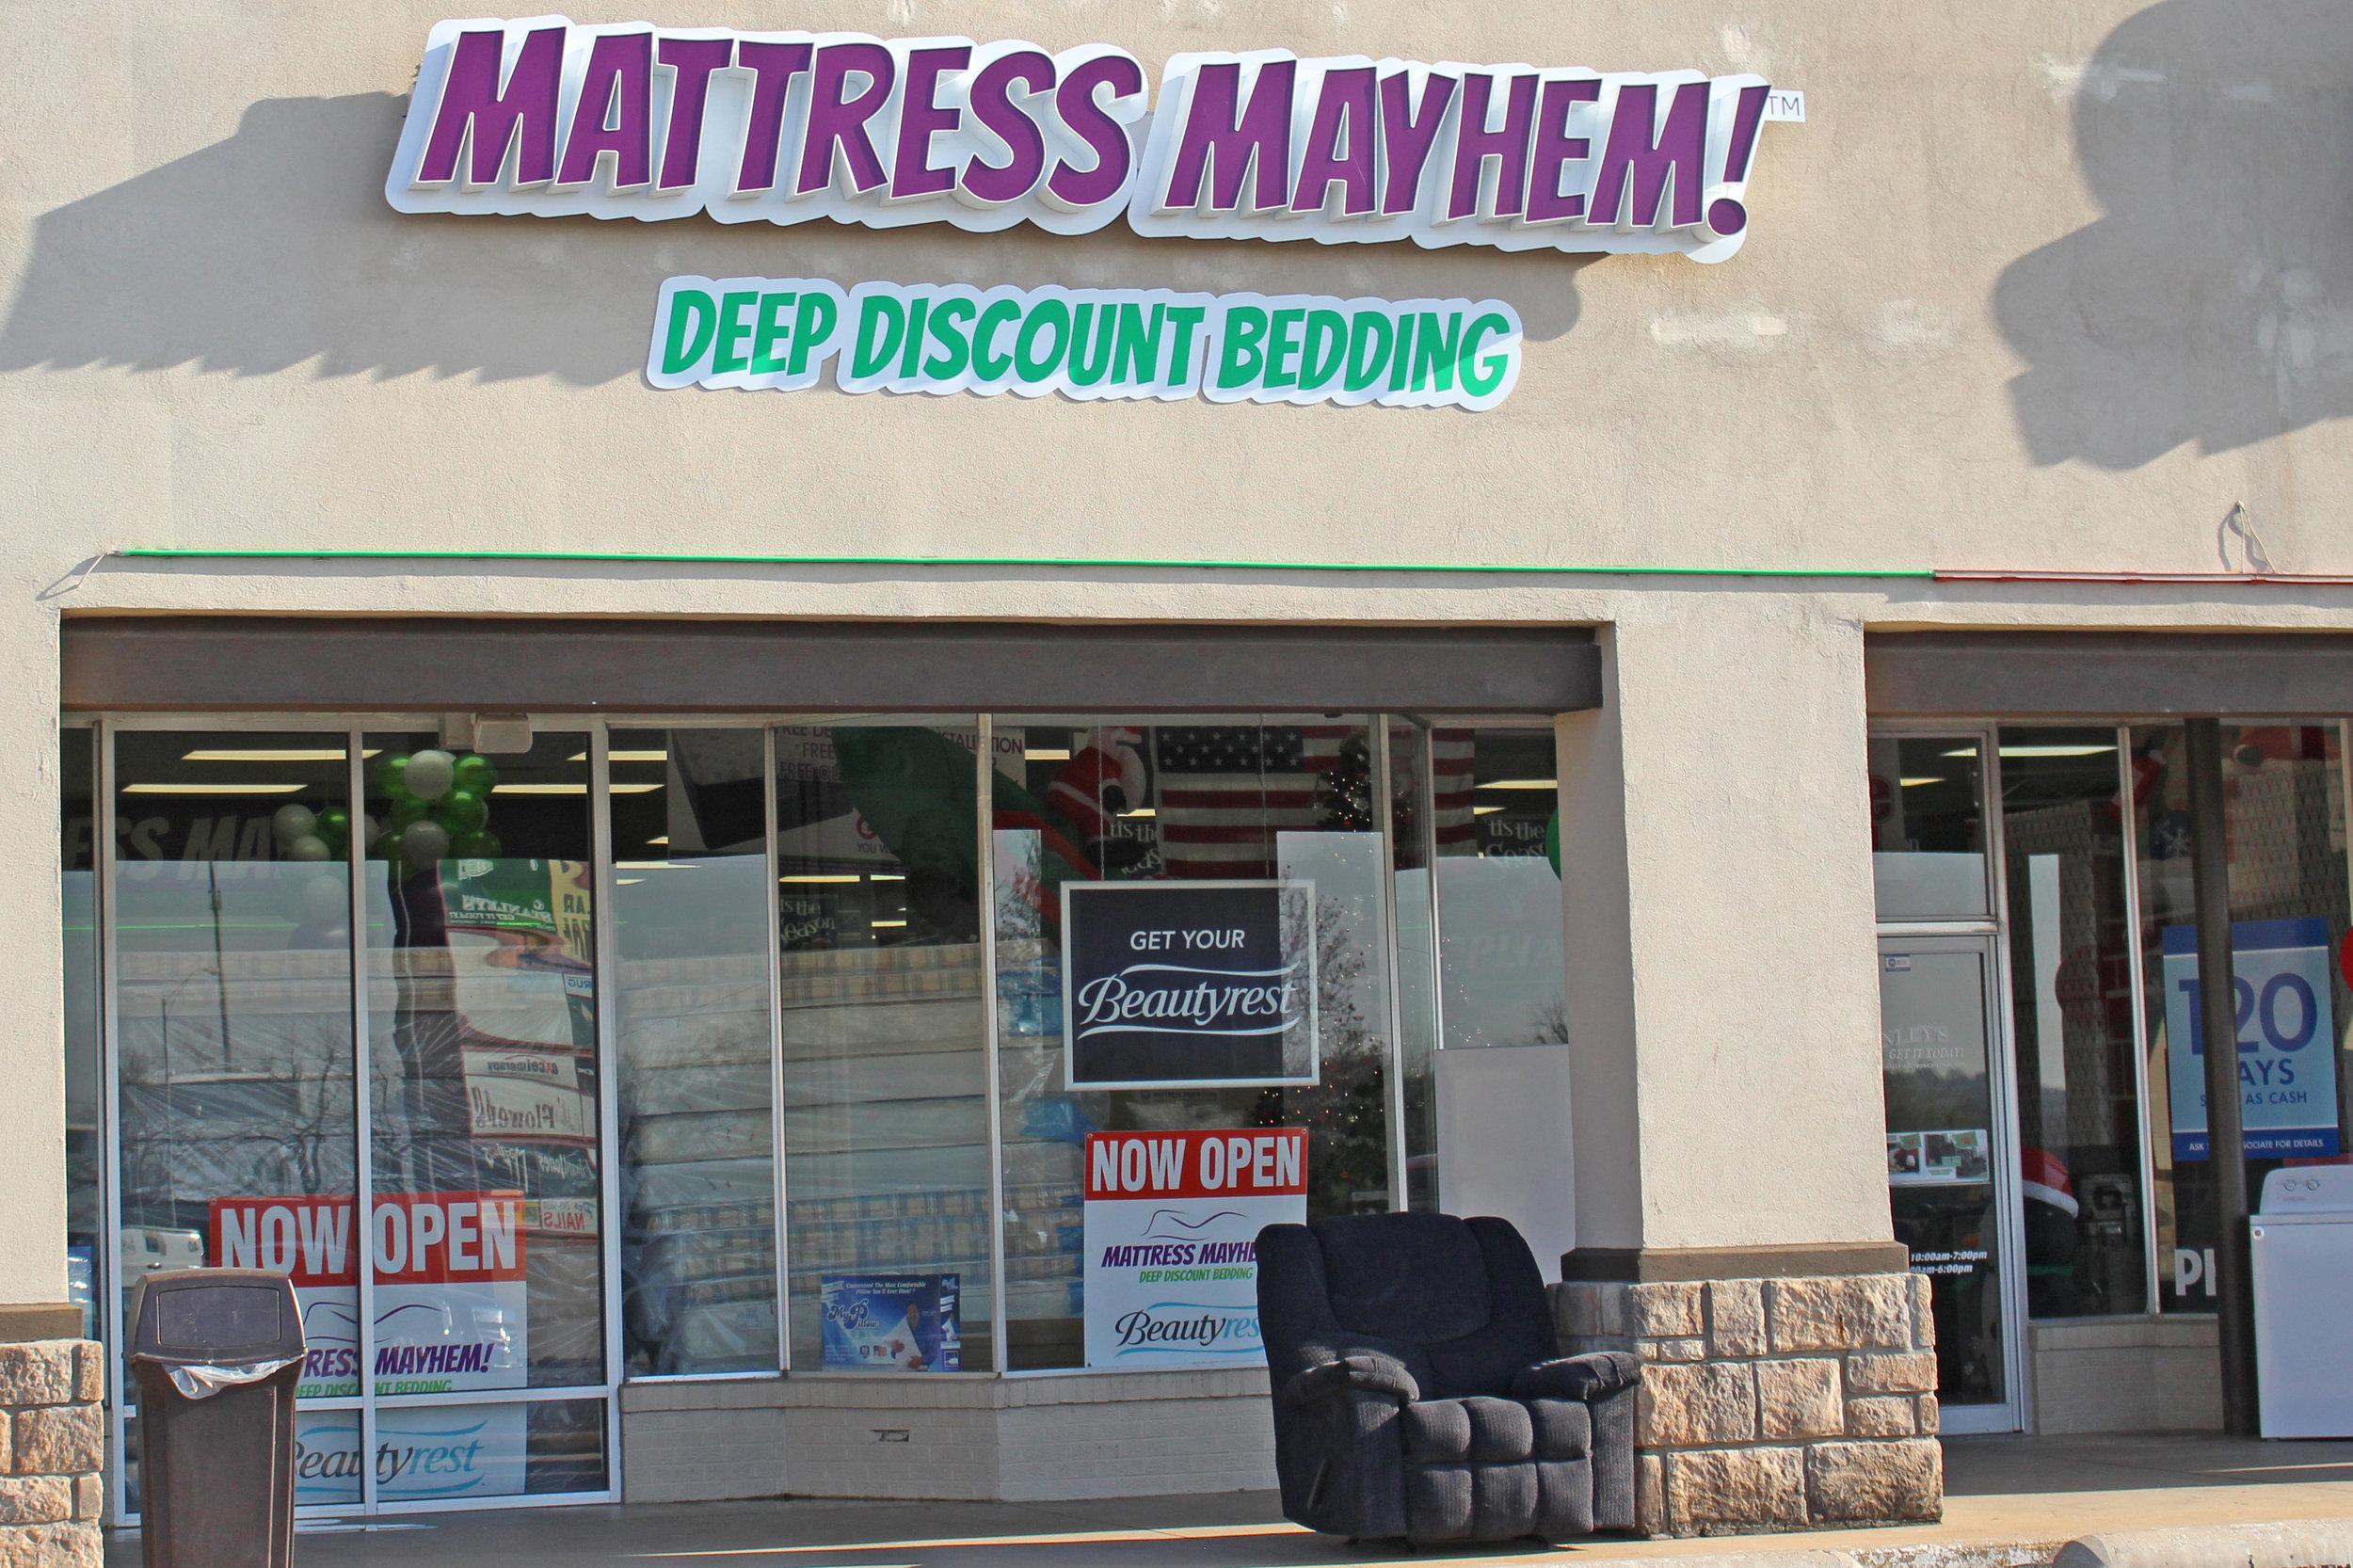 mattress mayhem - the shops at adams road 532 Plaza Court, suite A